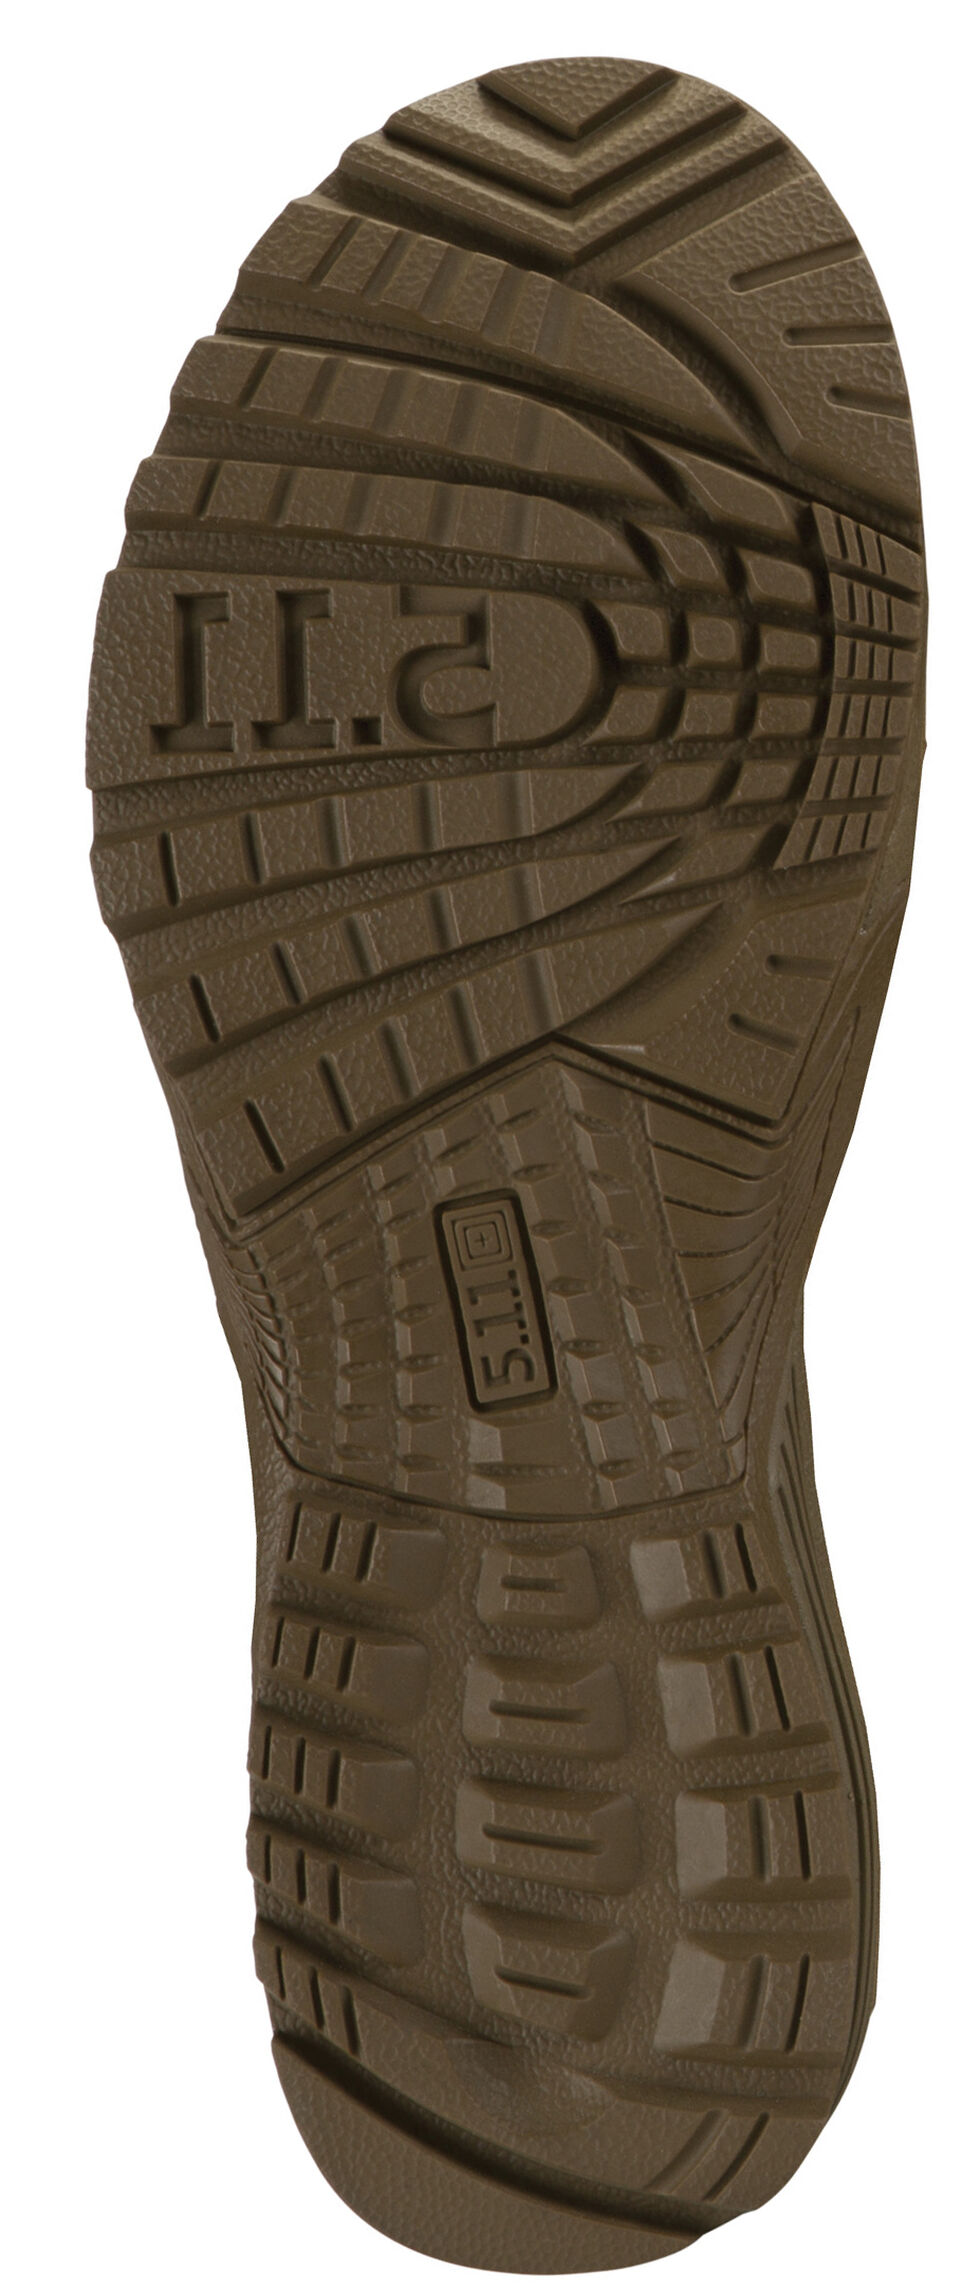 5.11 Tactical Men's Skyweight RapidDry Boots, Coyote Brown, hi-res